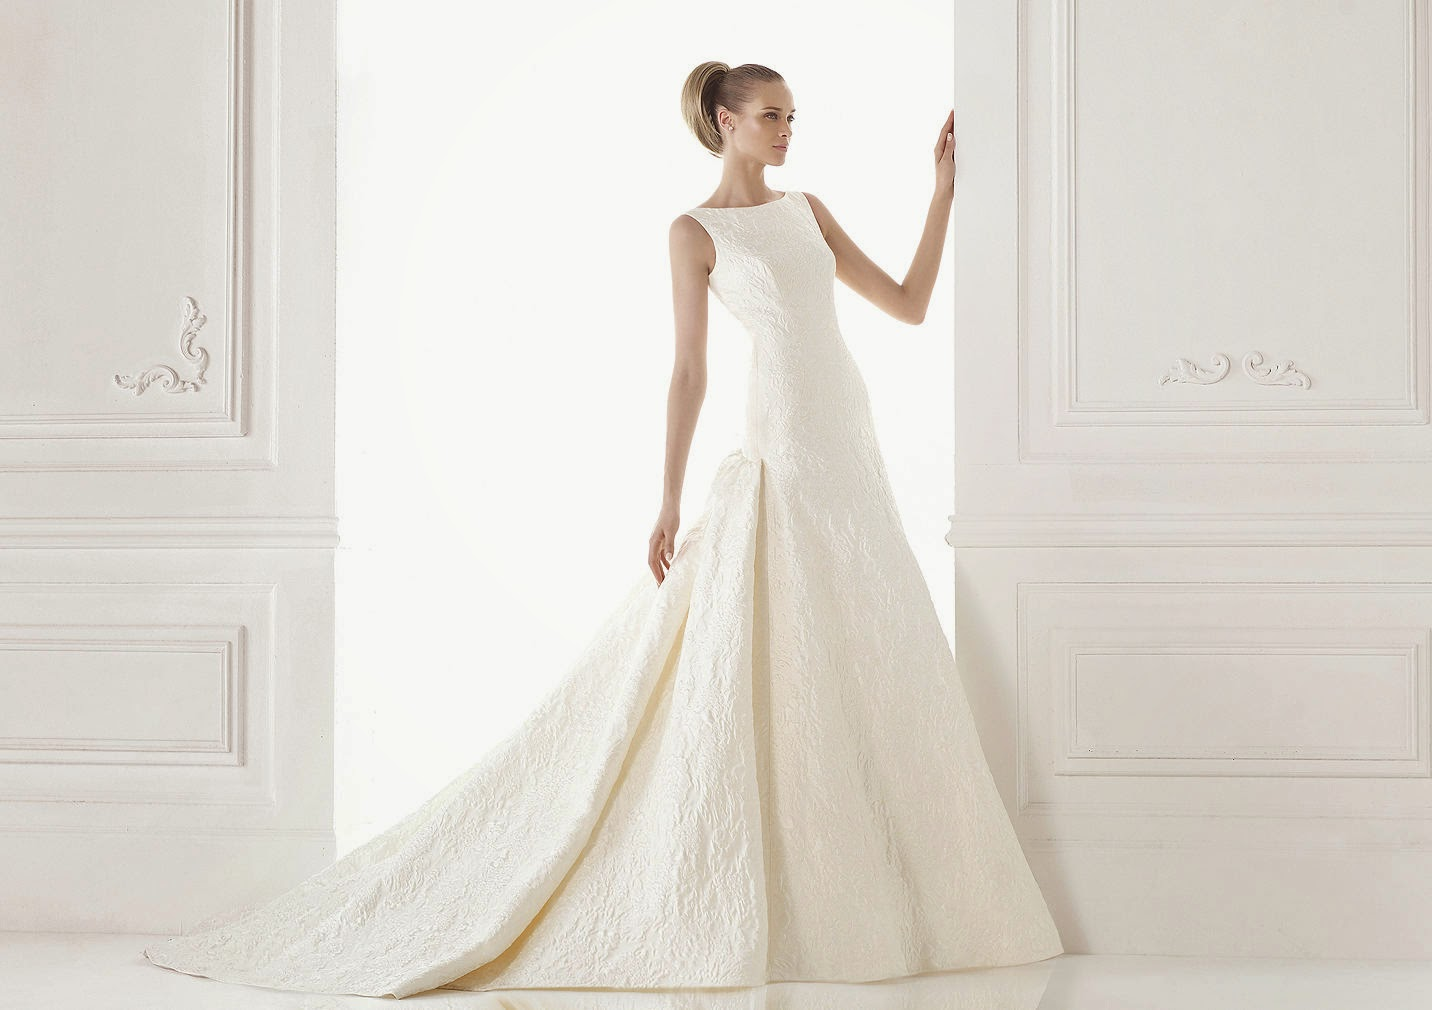 Robe mariée Atelier Pronovias 2015 encolure américaine wedding dress